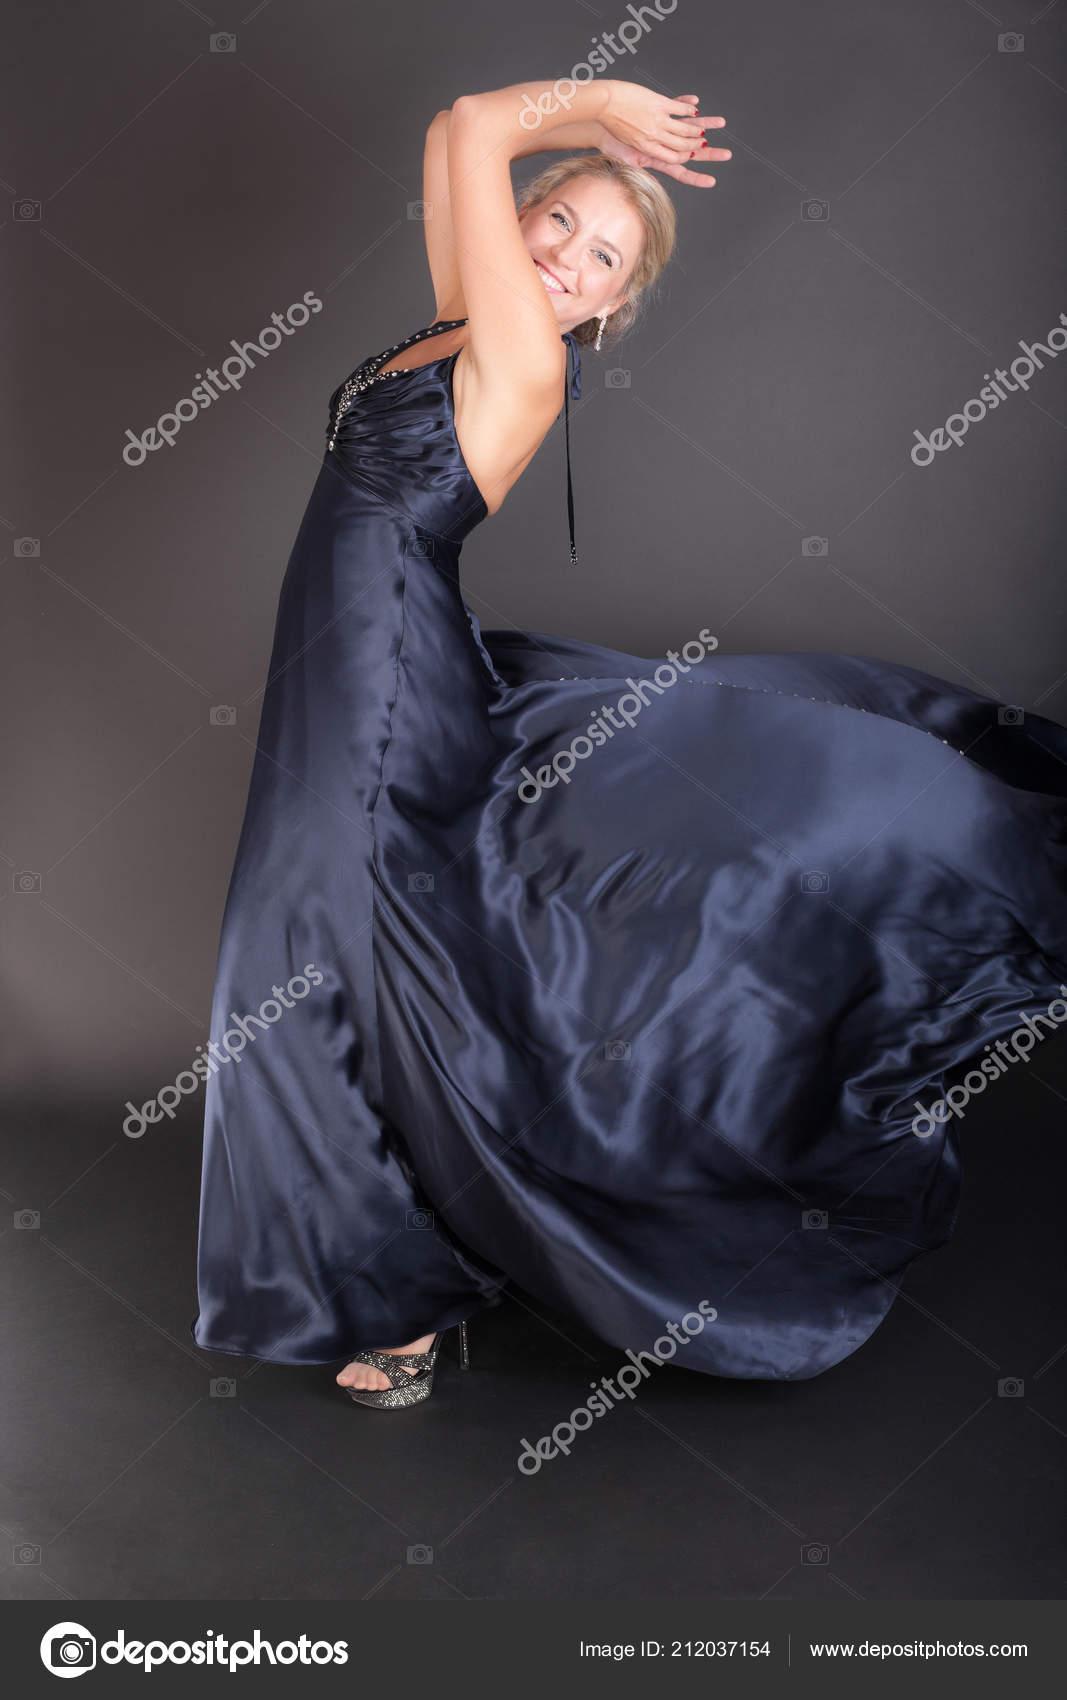 Chica Vestido Noche Azul Oscuro Sobre Fondo Negro Fotos De